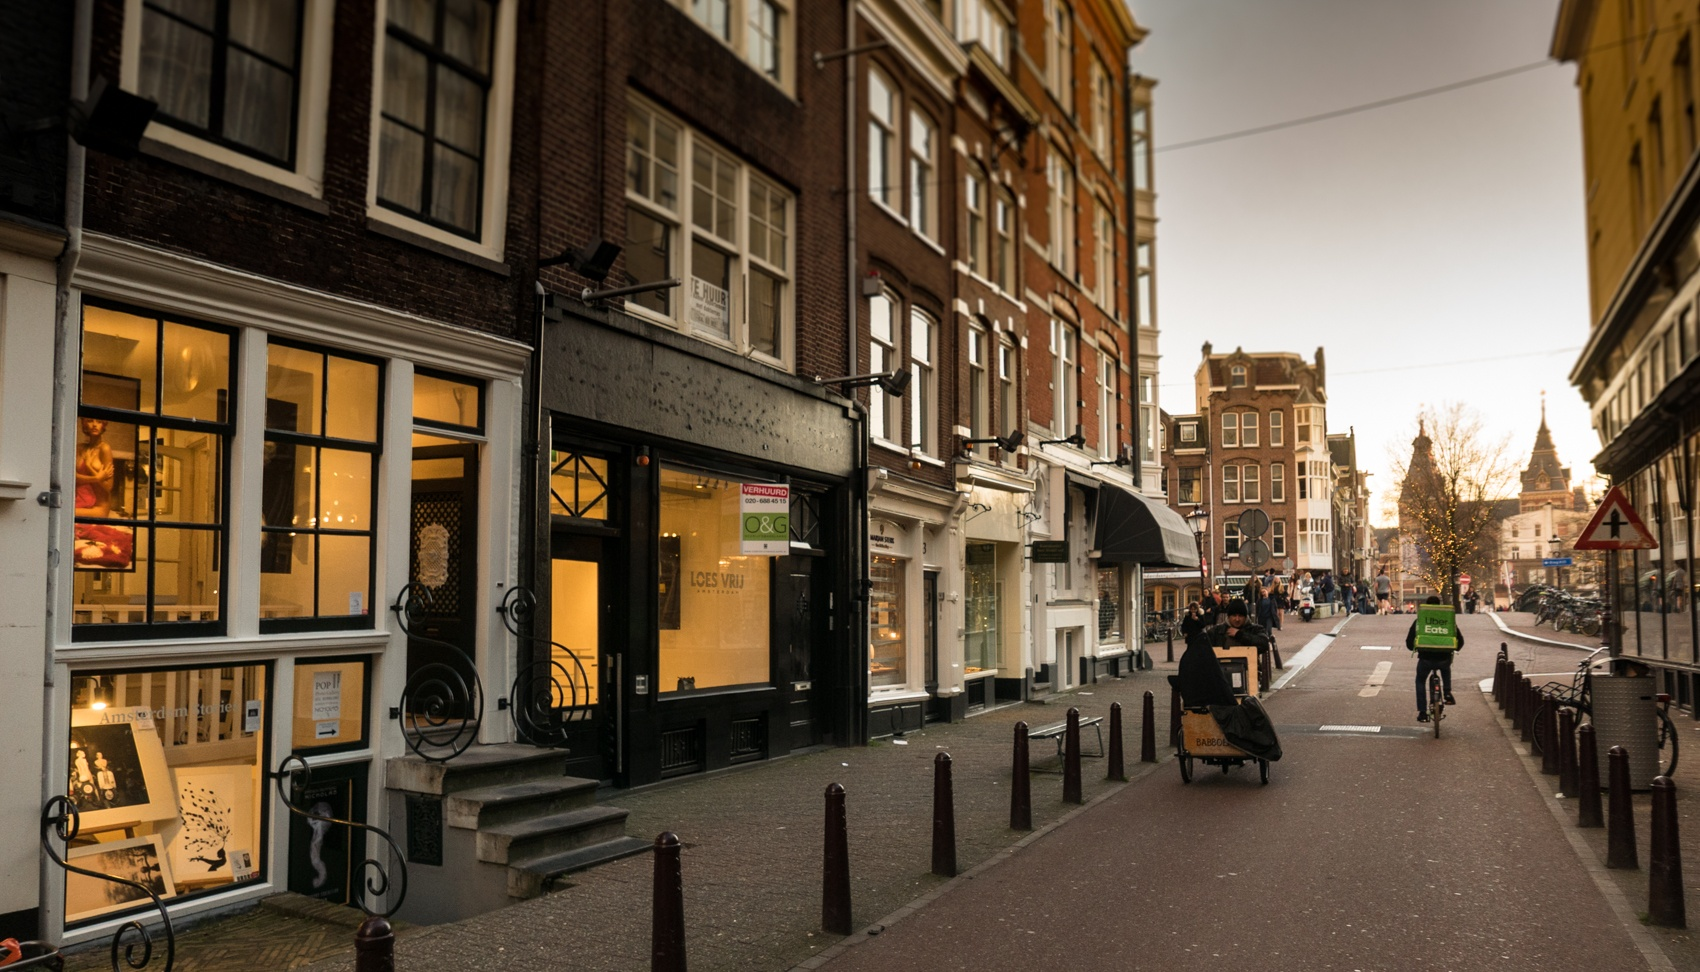 Nicholas Gallery in Spiegelstraat, Amsterdam